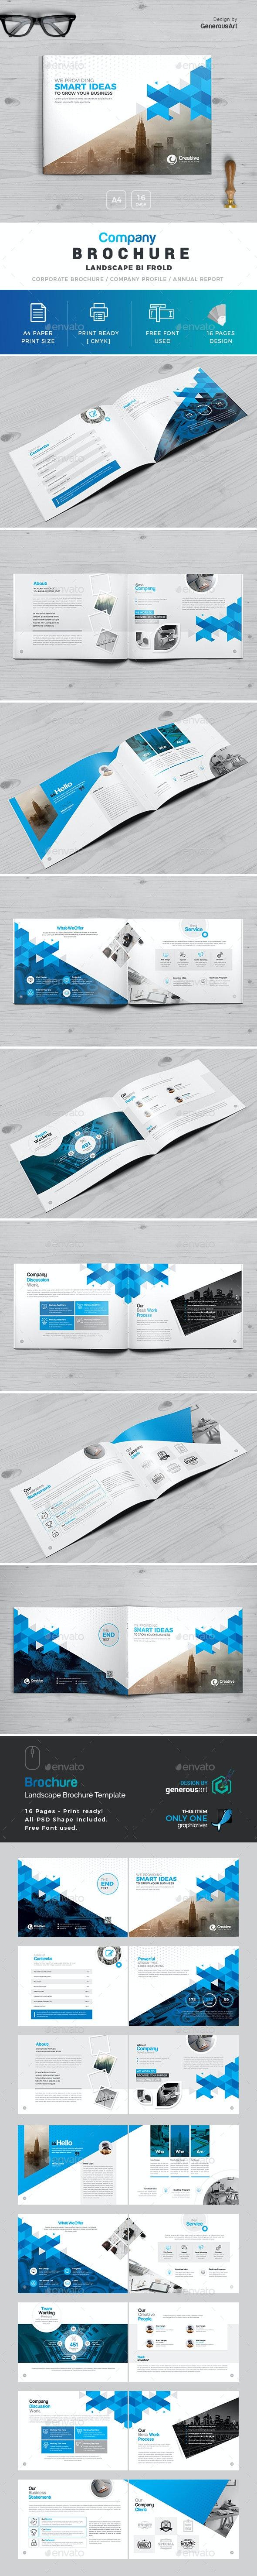 Business Landscape Brochure - Corporate Brochures